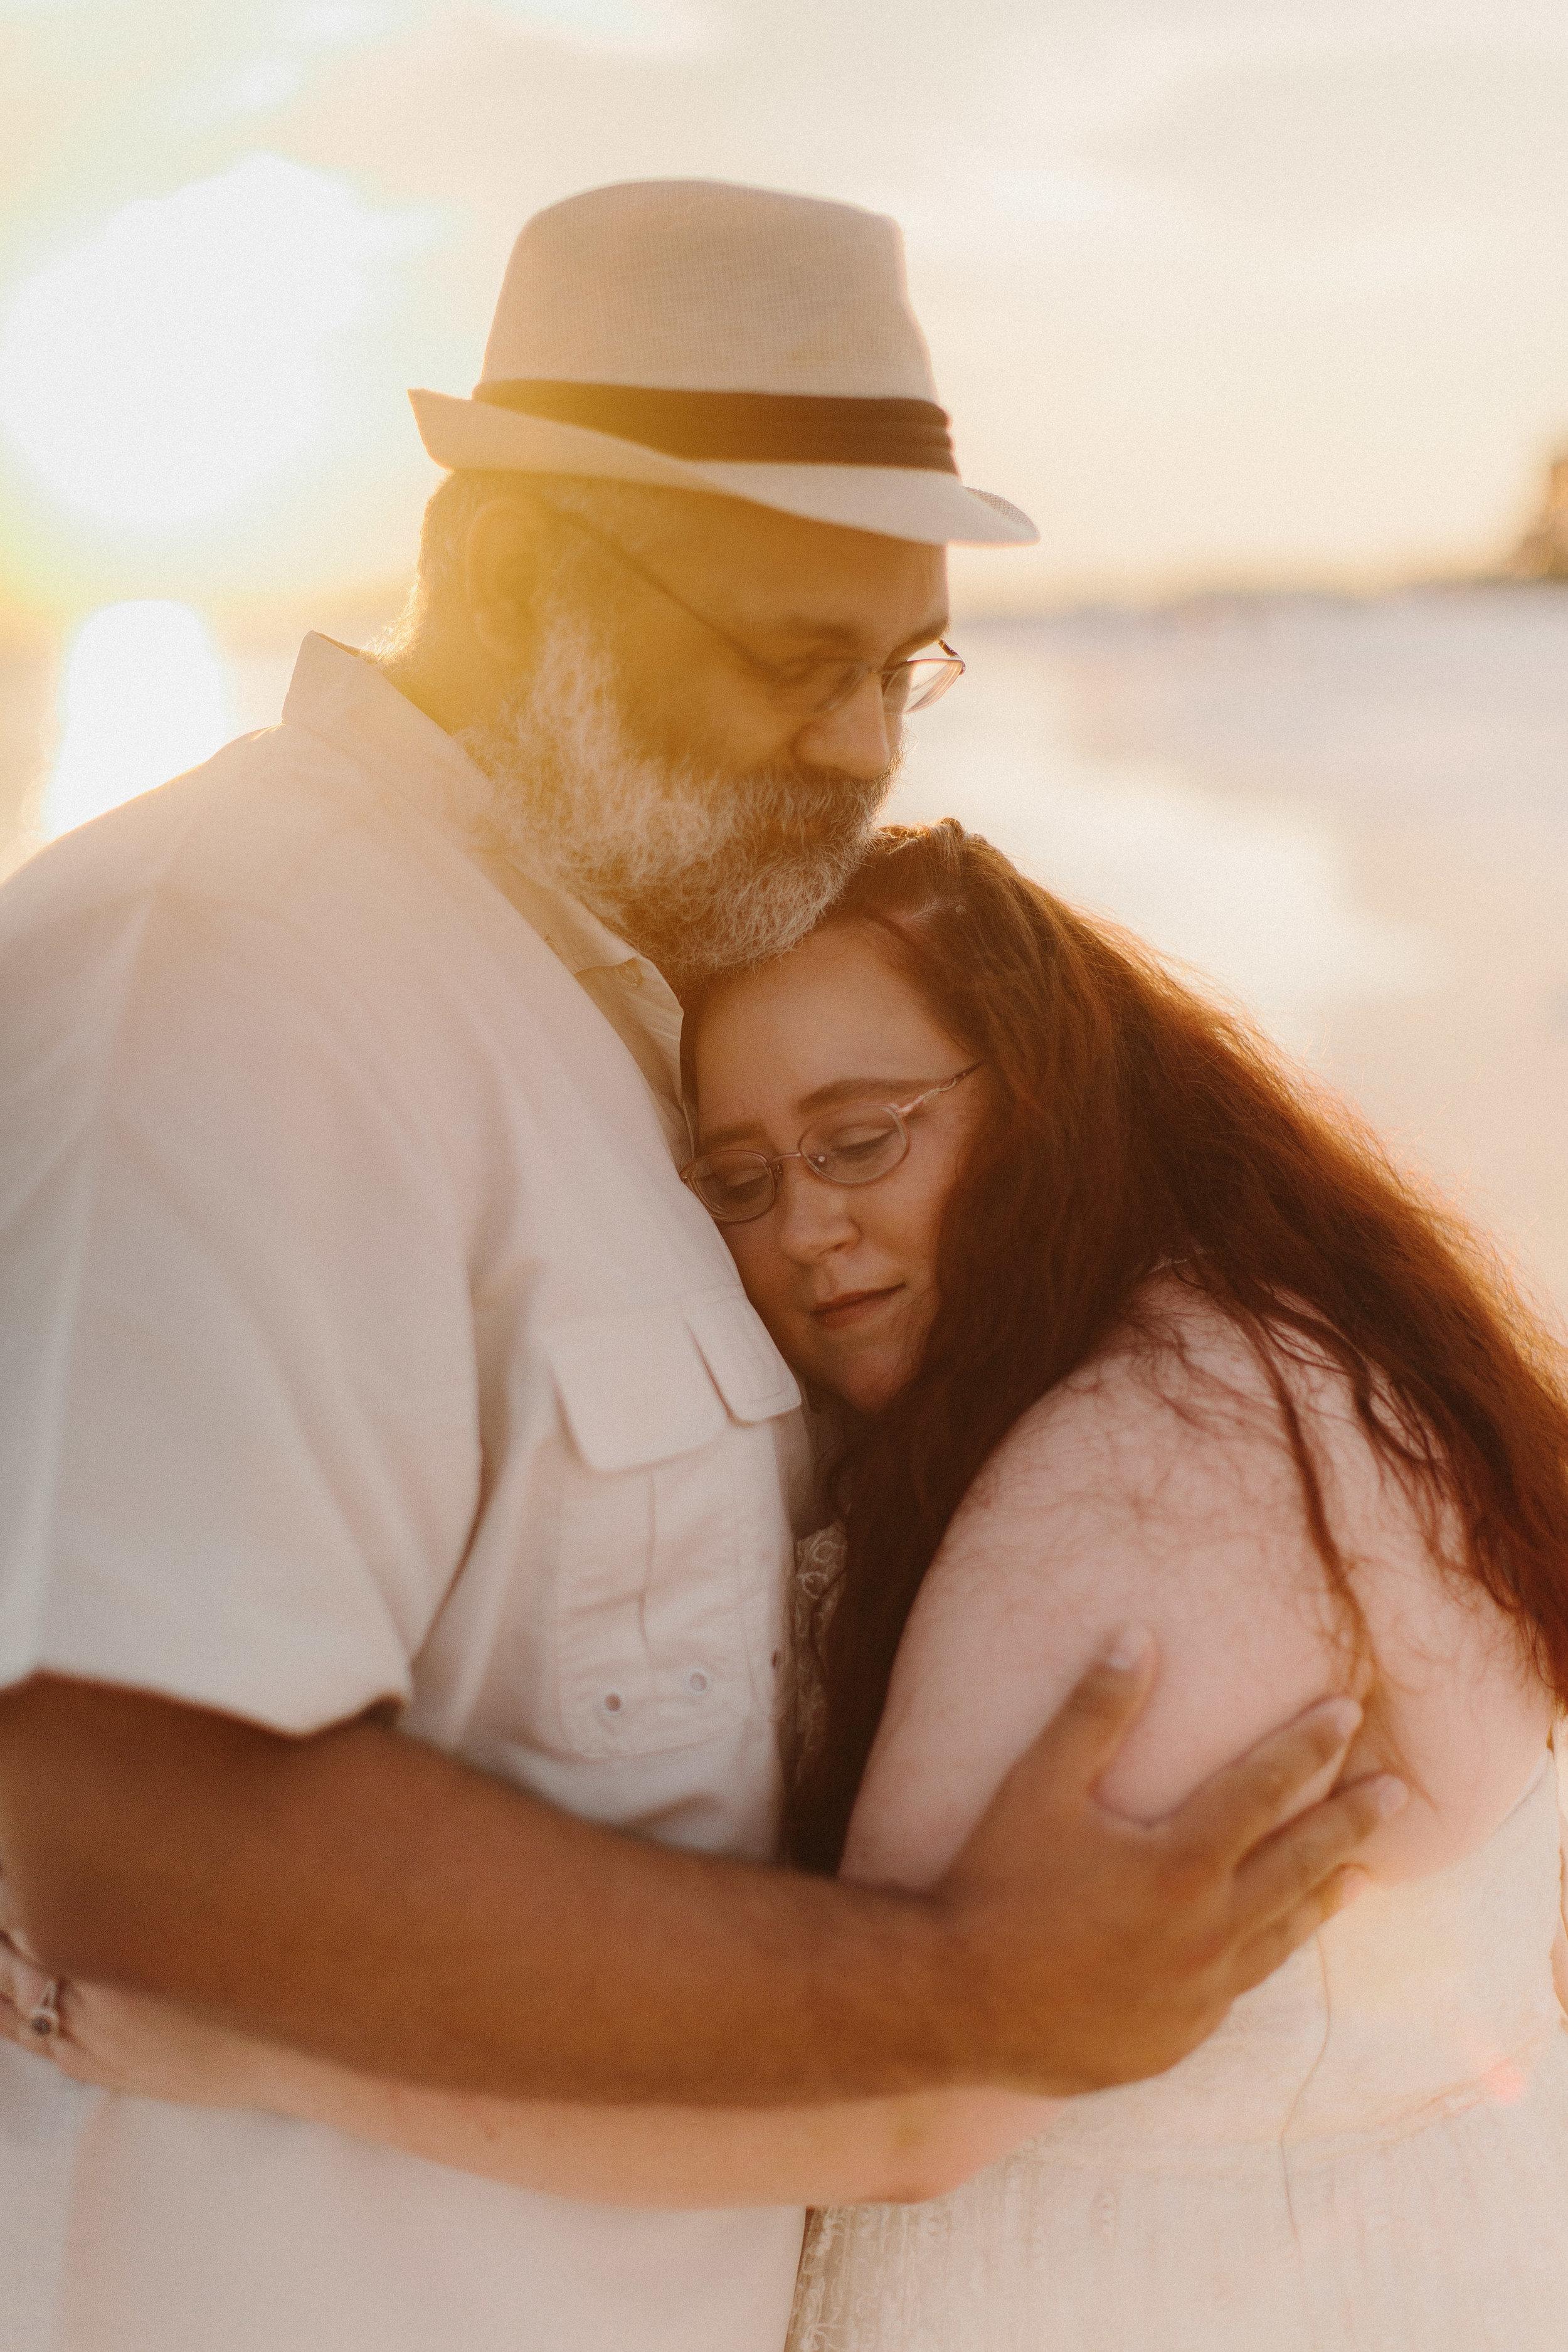 destin_sunset_beach_elopement_intimate_wedding_photographer_florida_documentary_1277.jpg